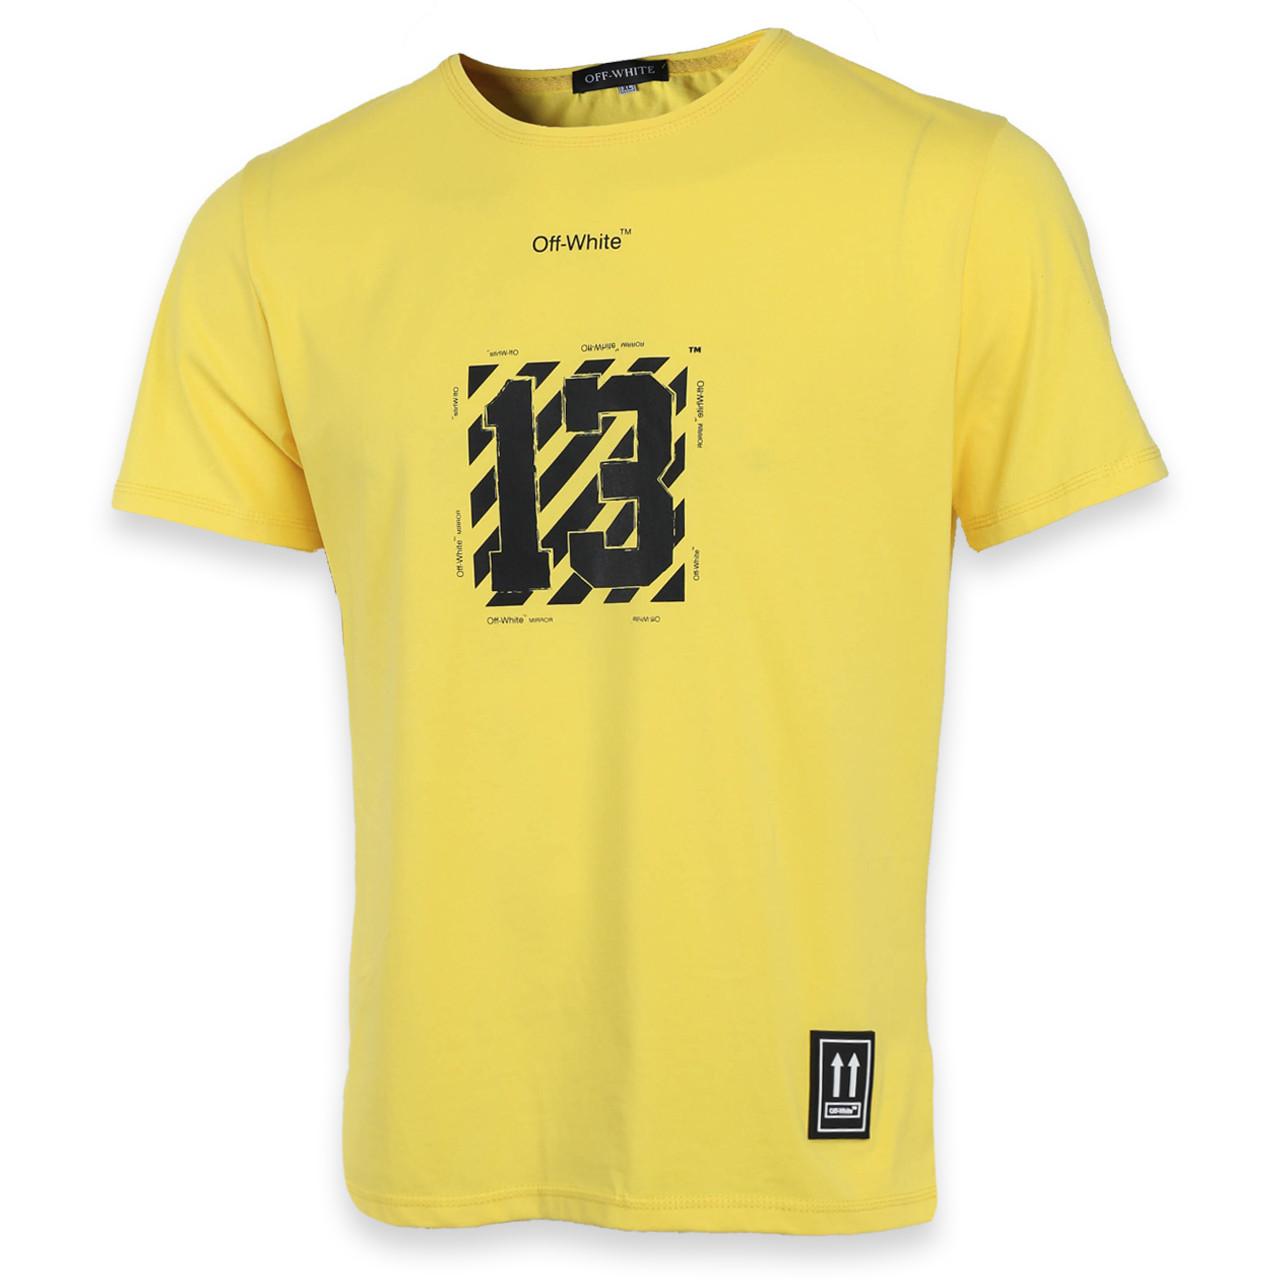 Футболка мужская желтая с принтом OFF-WHITE №13 Ф-10 YEL L(Р) 19-651-020-001